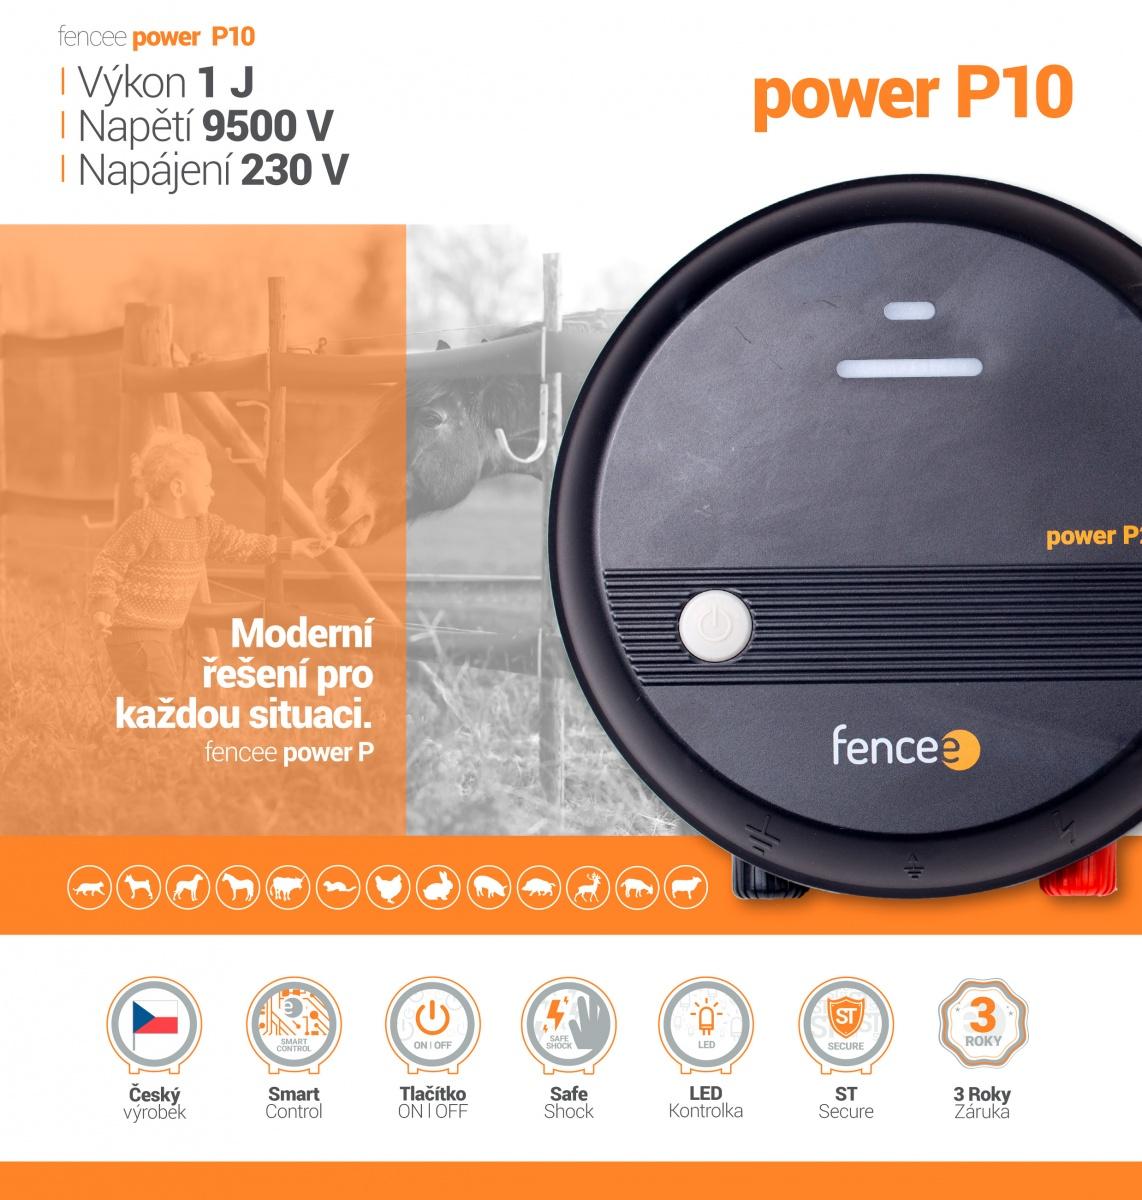 fencee_power_P10__generator_elektrickeho_ohradniku_TOP